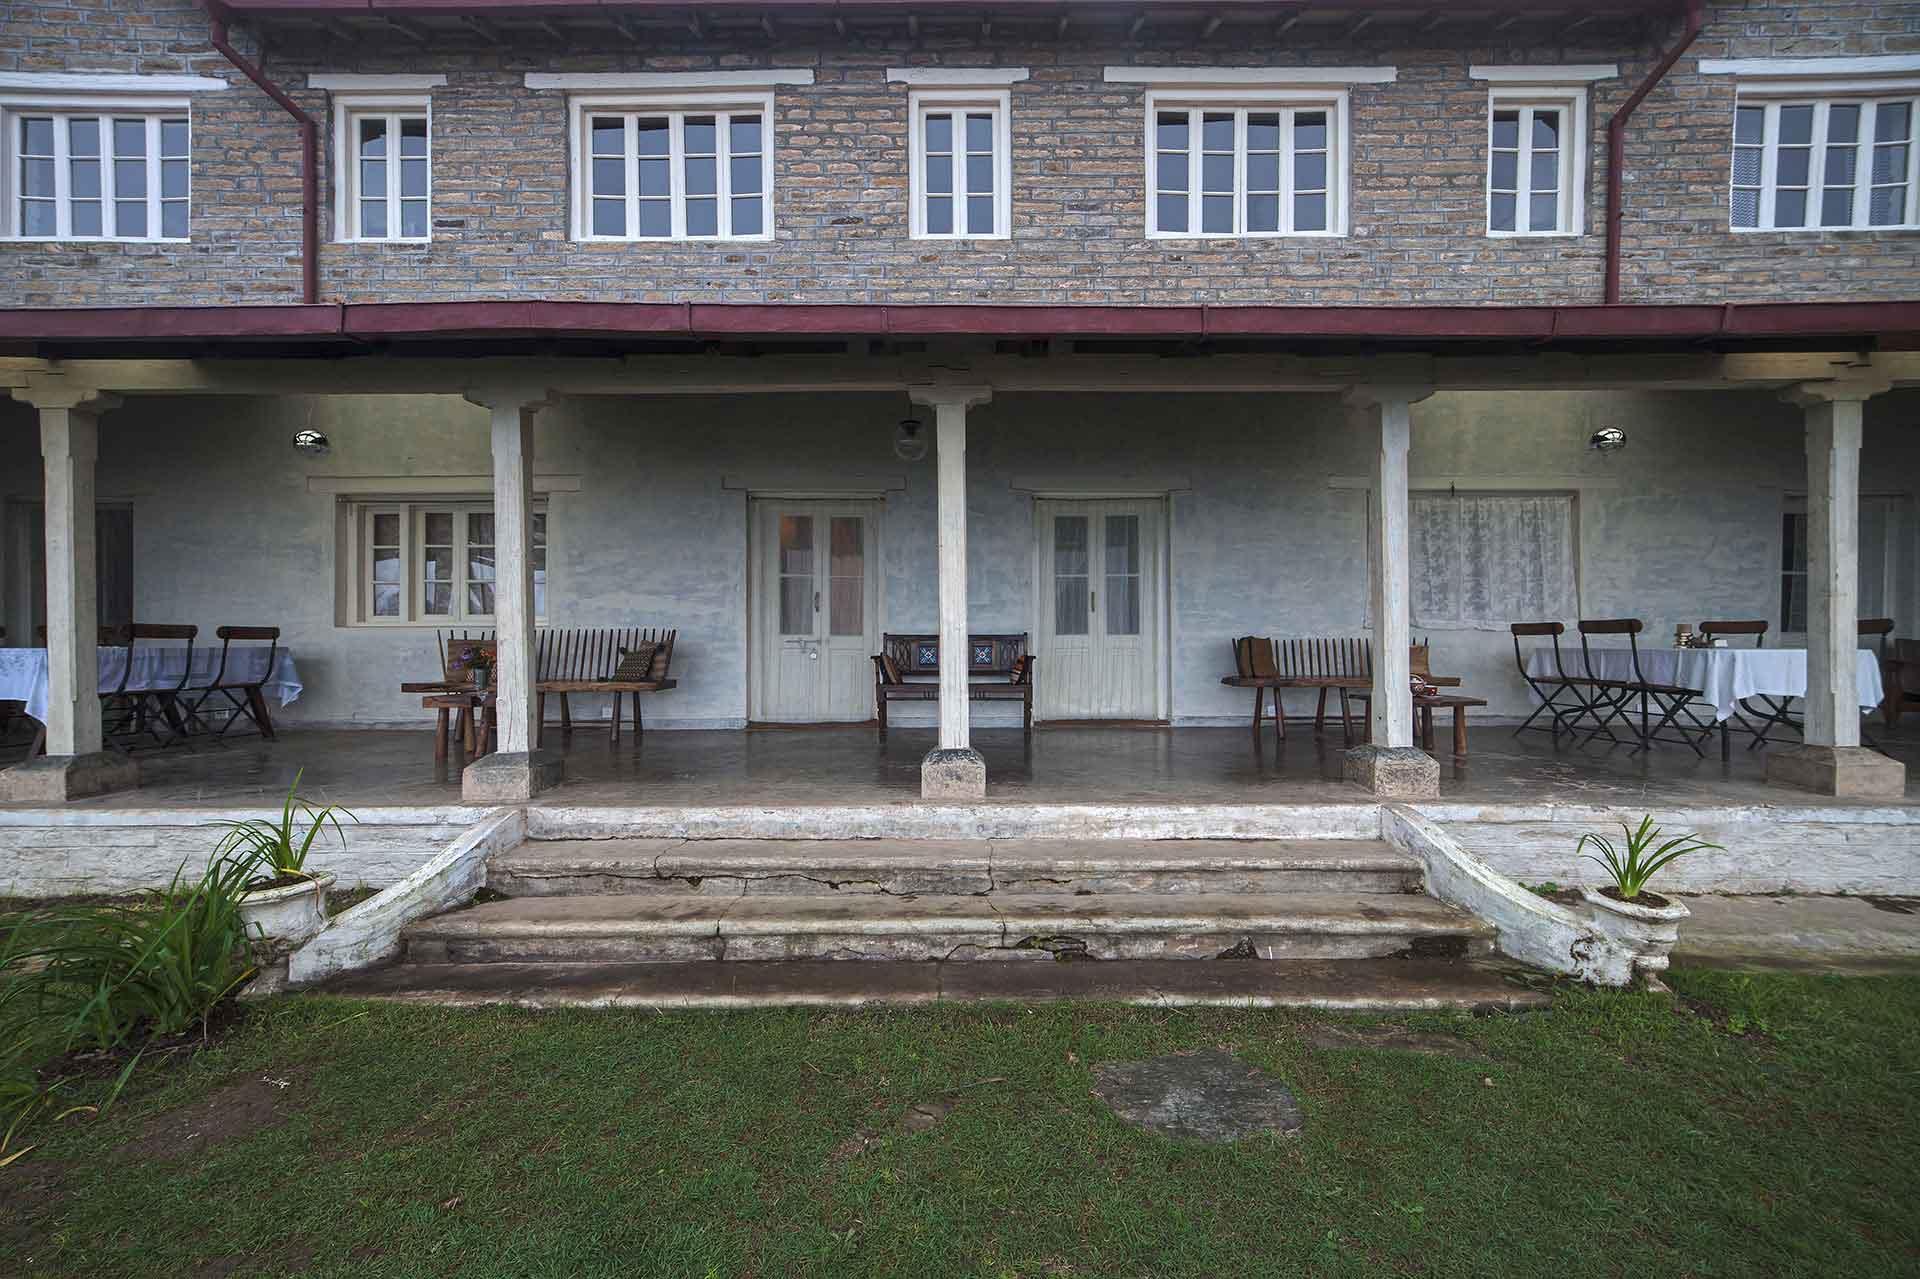 This verandah evokes the nostalgia of the Raj...